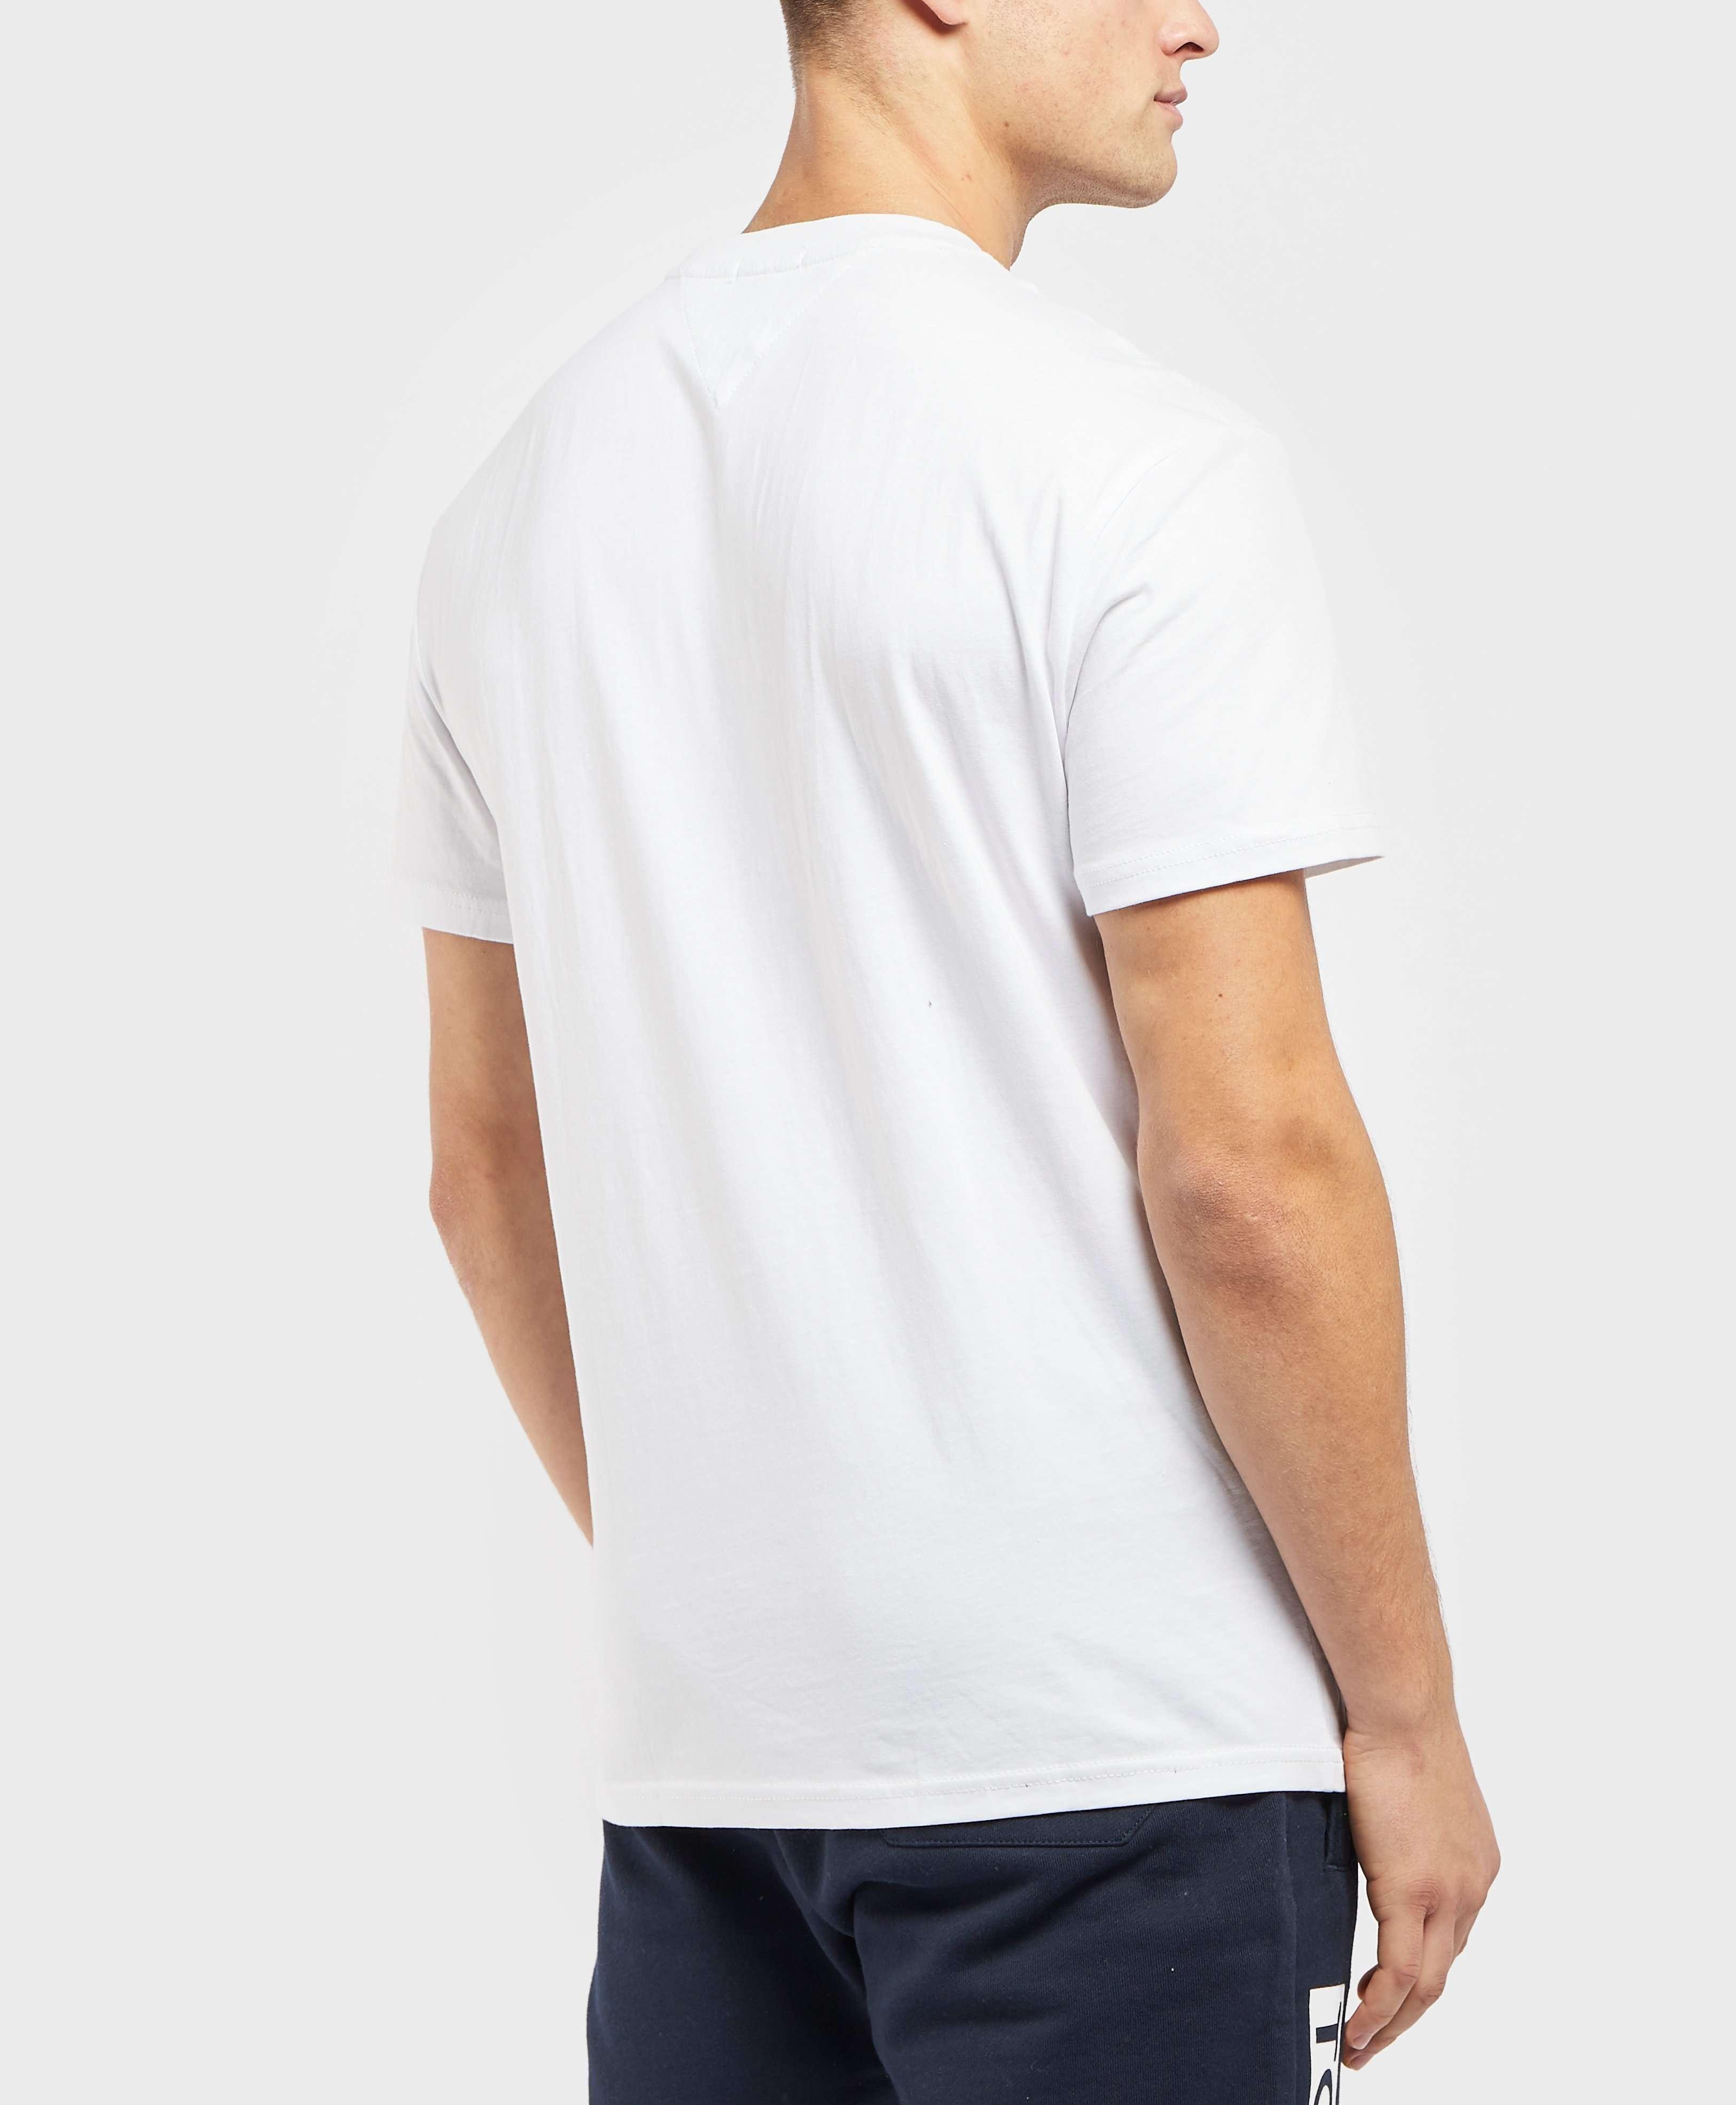 Tommy Jeans Graffiti Box Logo Short Sleeve T-Shirt